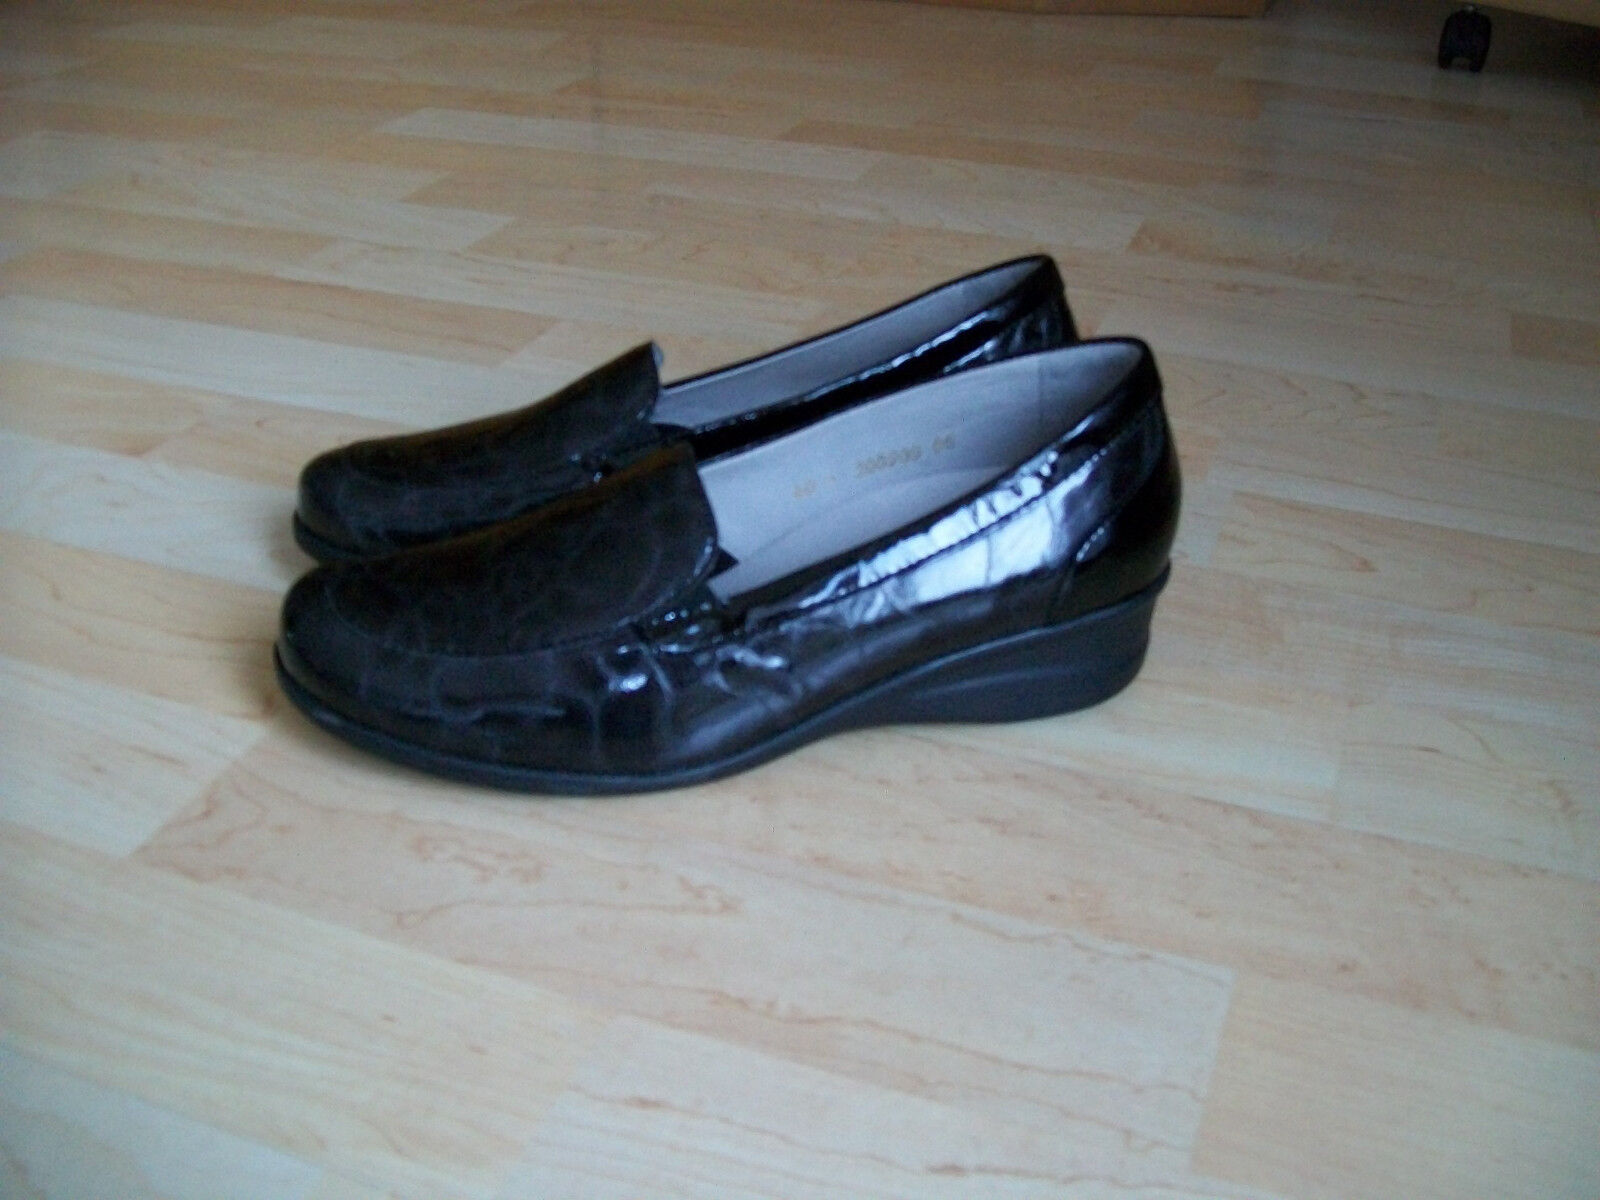 VITAFORM Damenschuhe Schuhe Halbschuhe Slipper Gr. 40, Leder, antrazit, NW